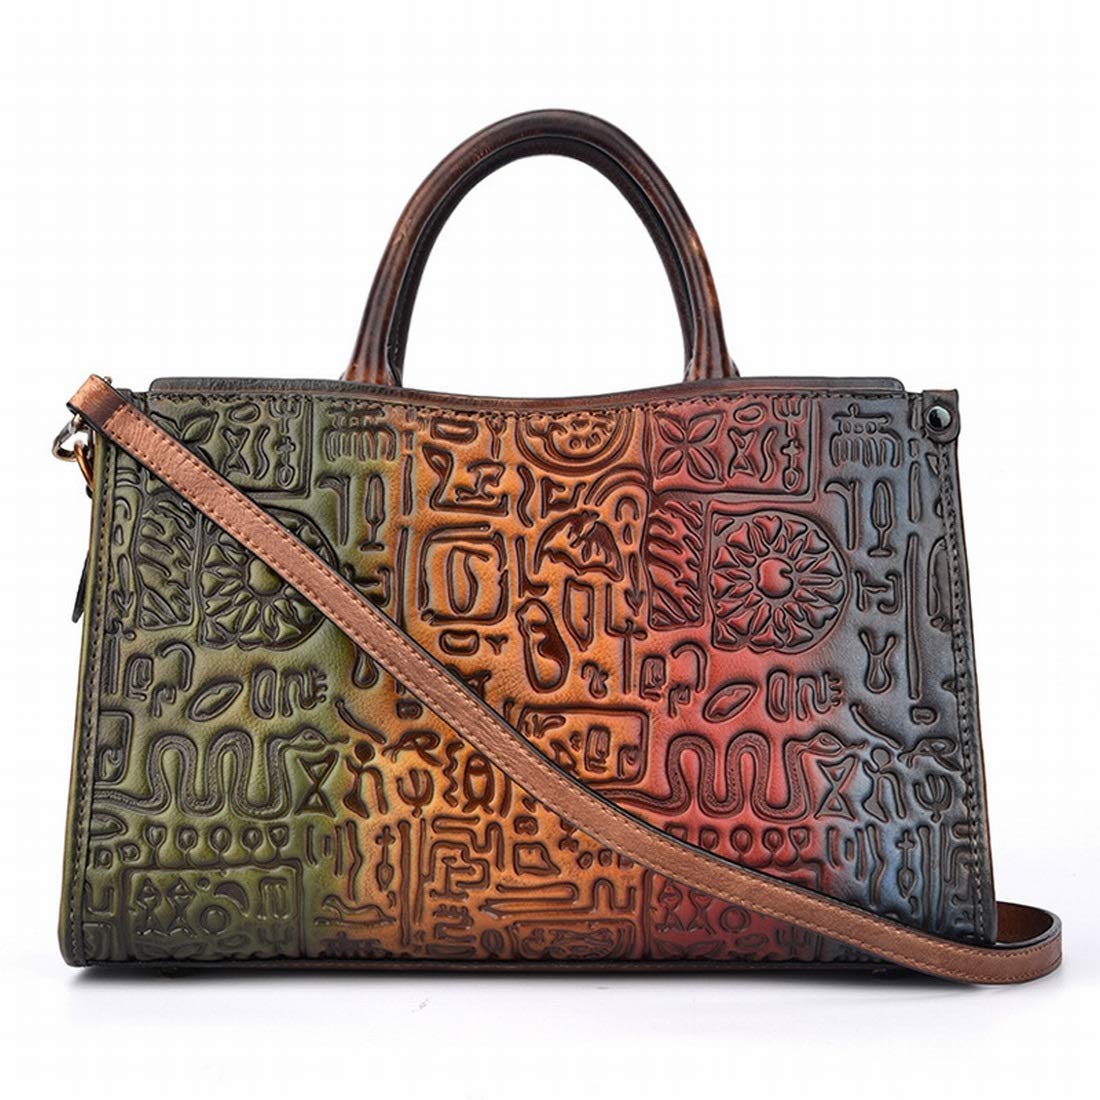 6d8ed725a658e Sixminyo Handtasche Vintage Satchel f uuml r f uuml r f uuml r Frauen PU- Leder-Umh auml ngetasche mit langem verstellbarem Gurt (Farbe braun)  B07PDGNVK8 ...